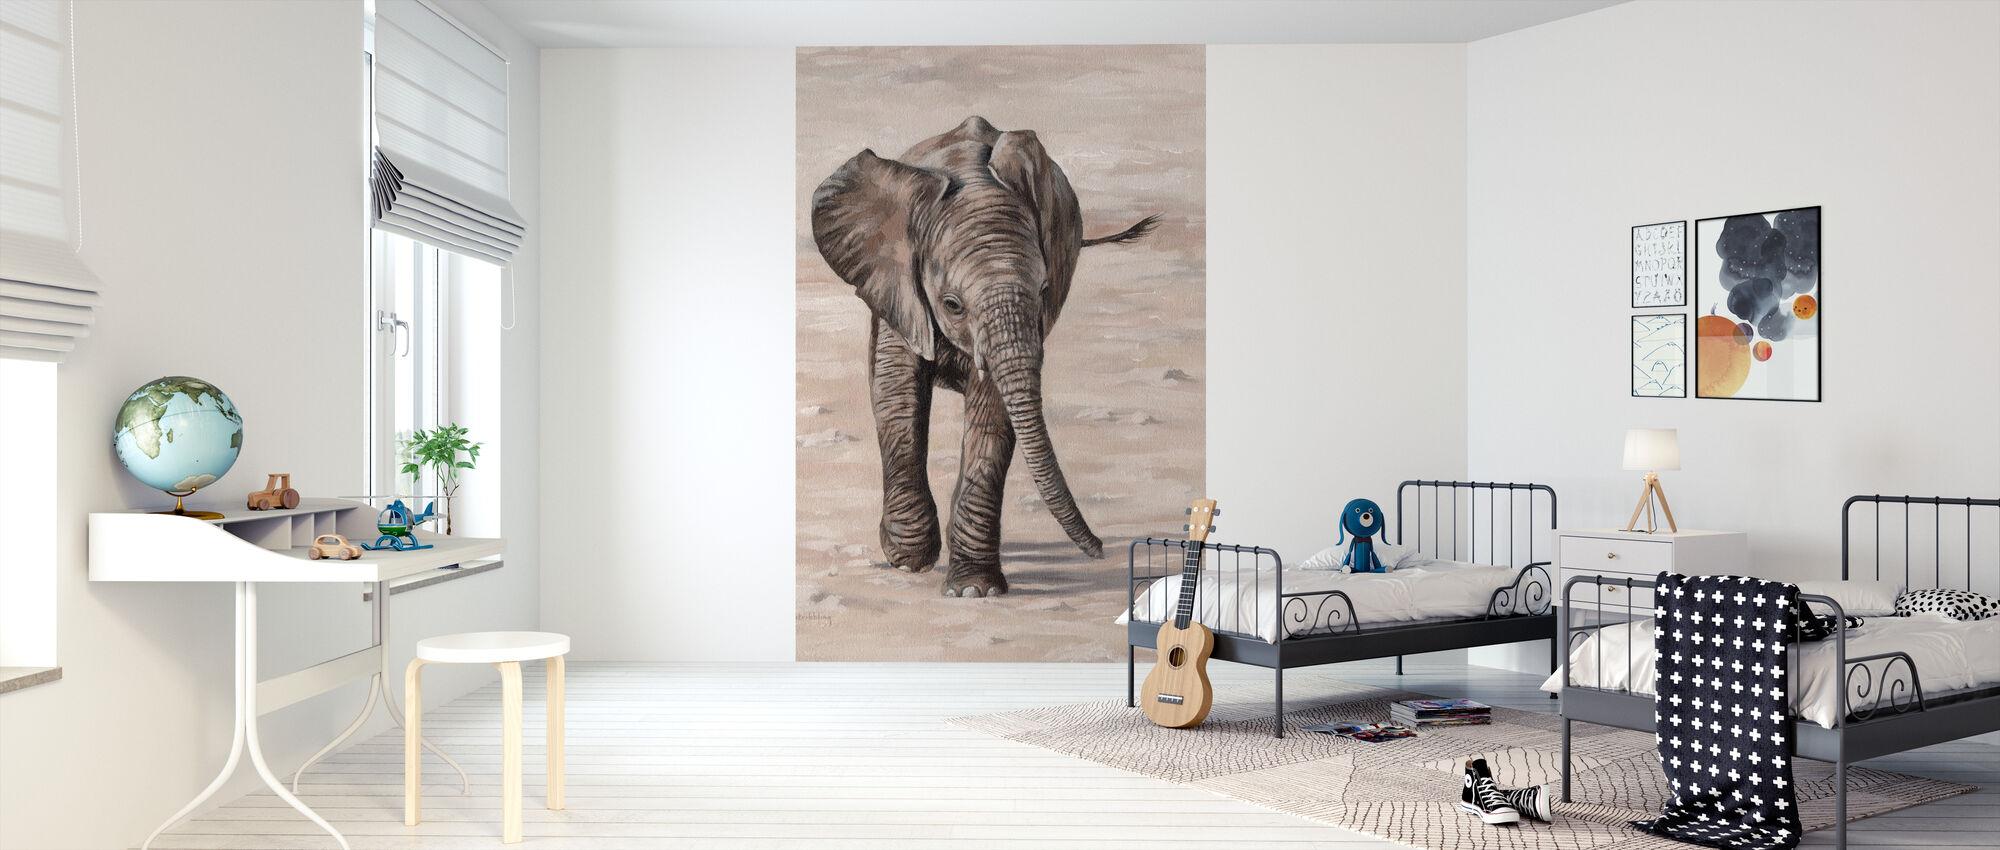 African Elephant Calf - Wallpaper - Kids Room